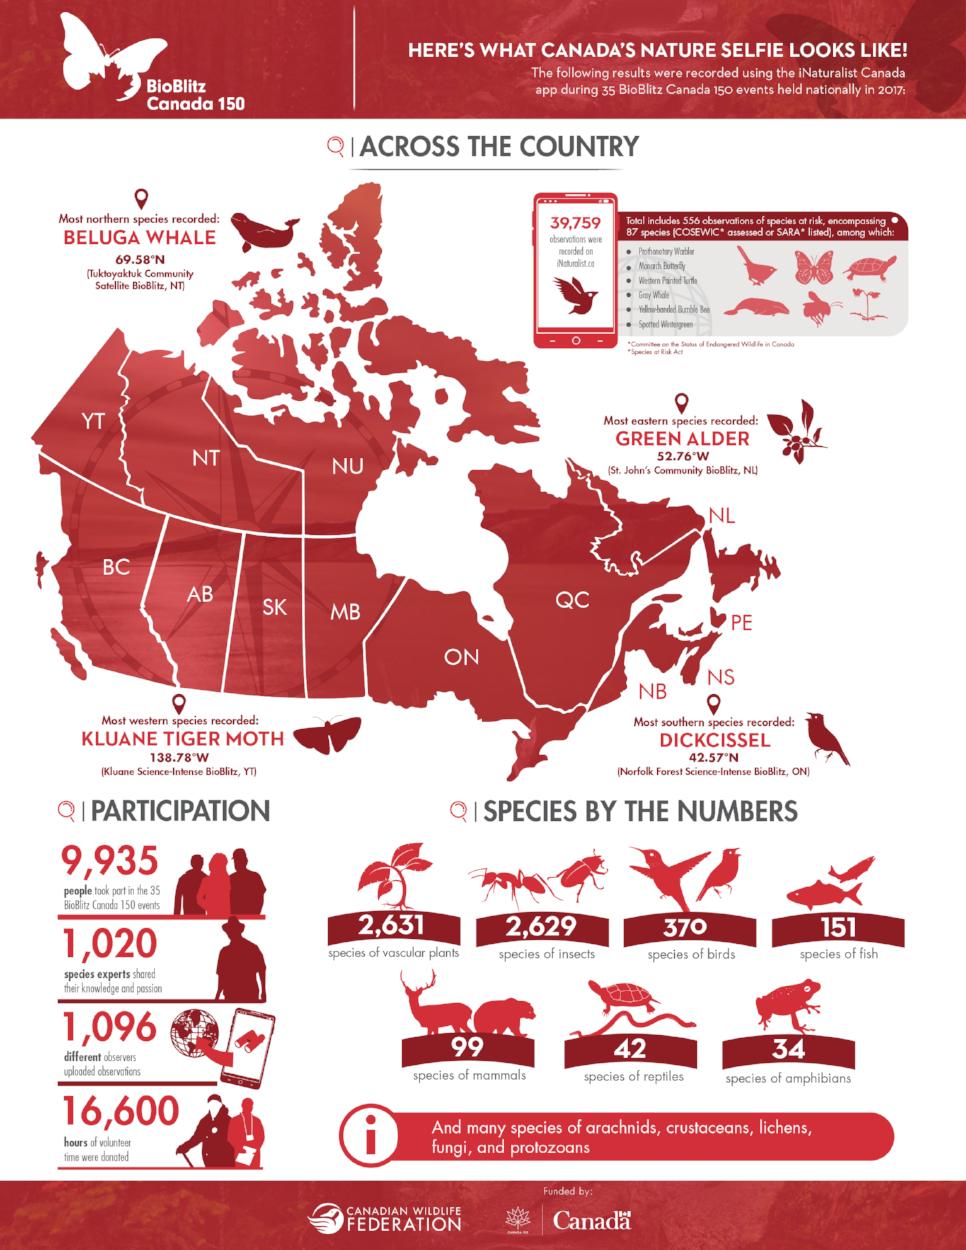 cwf_bioblitz_infographic.png